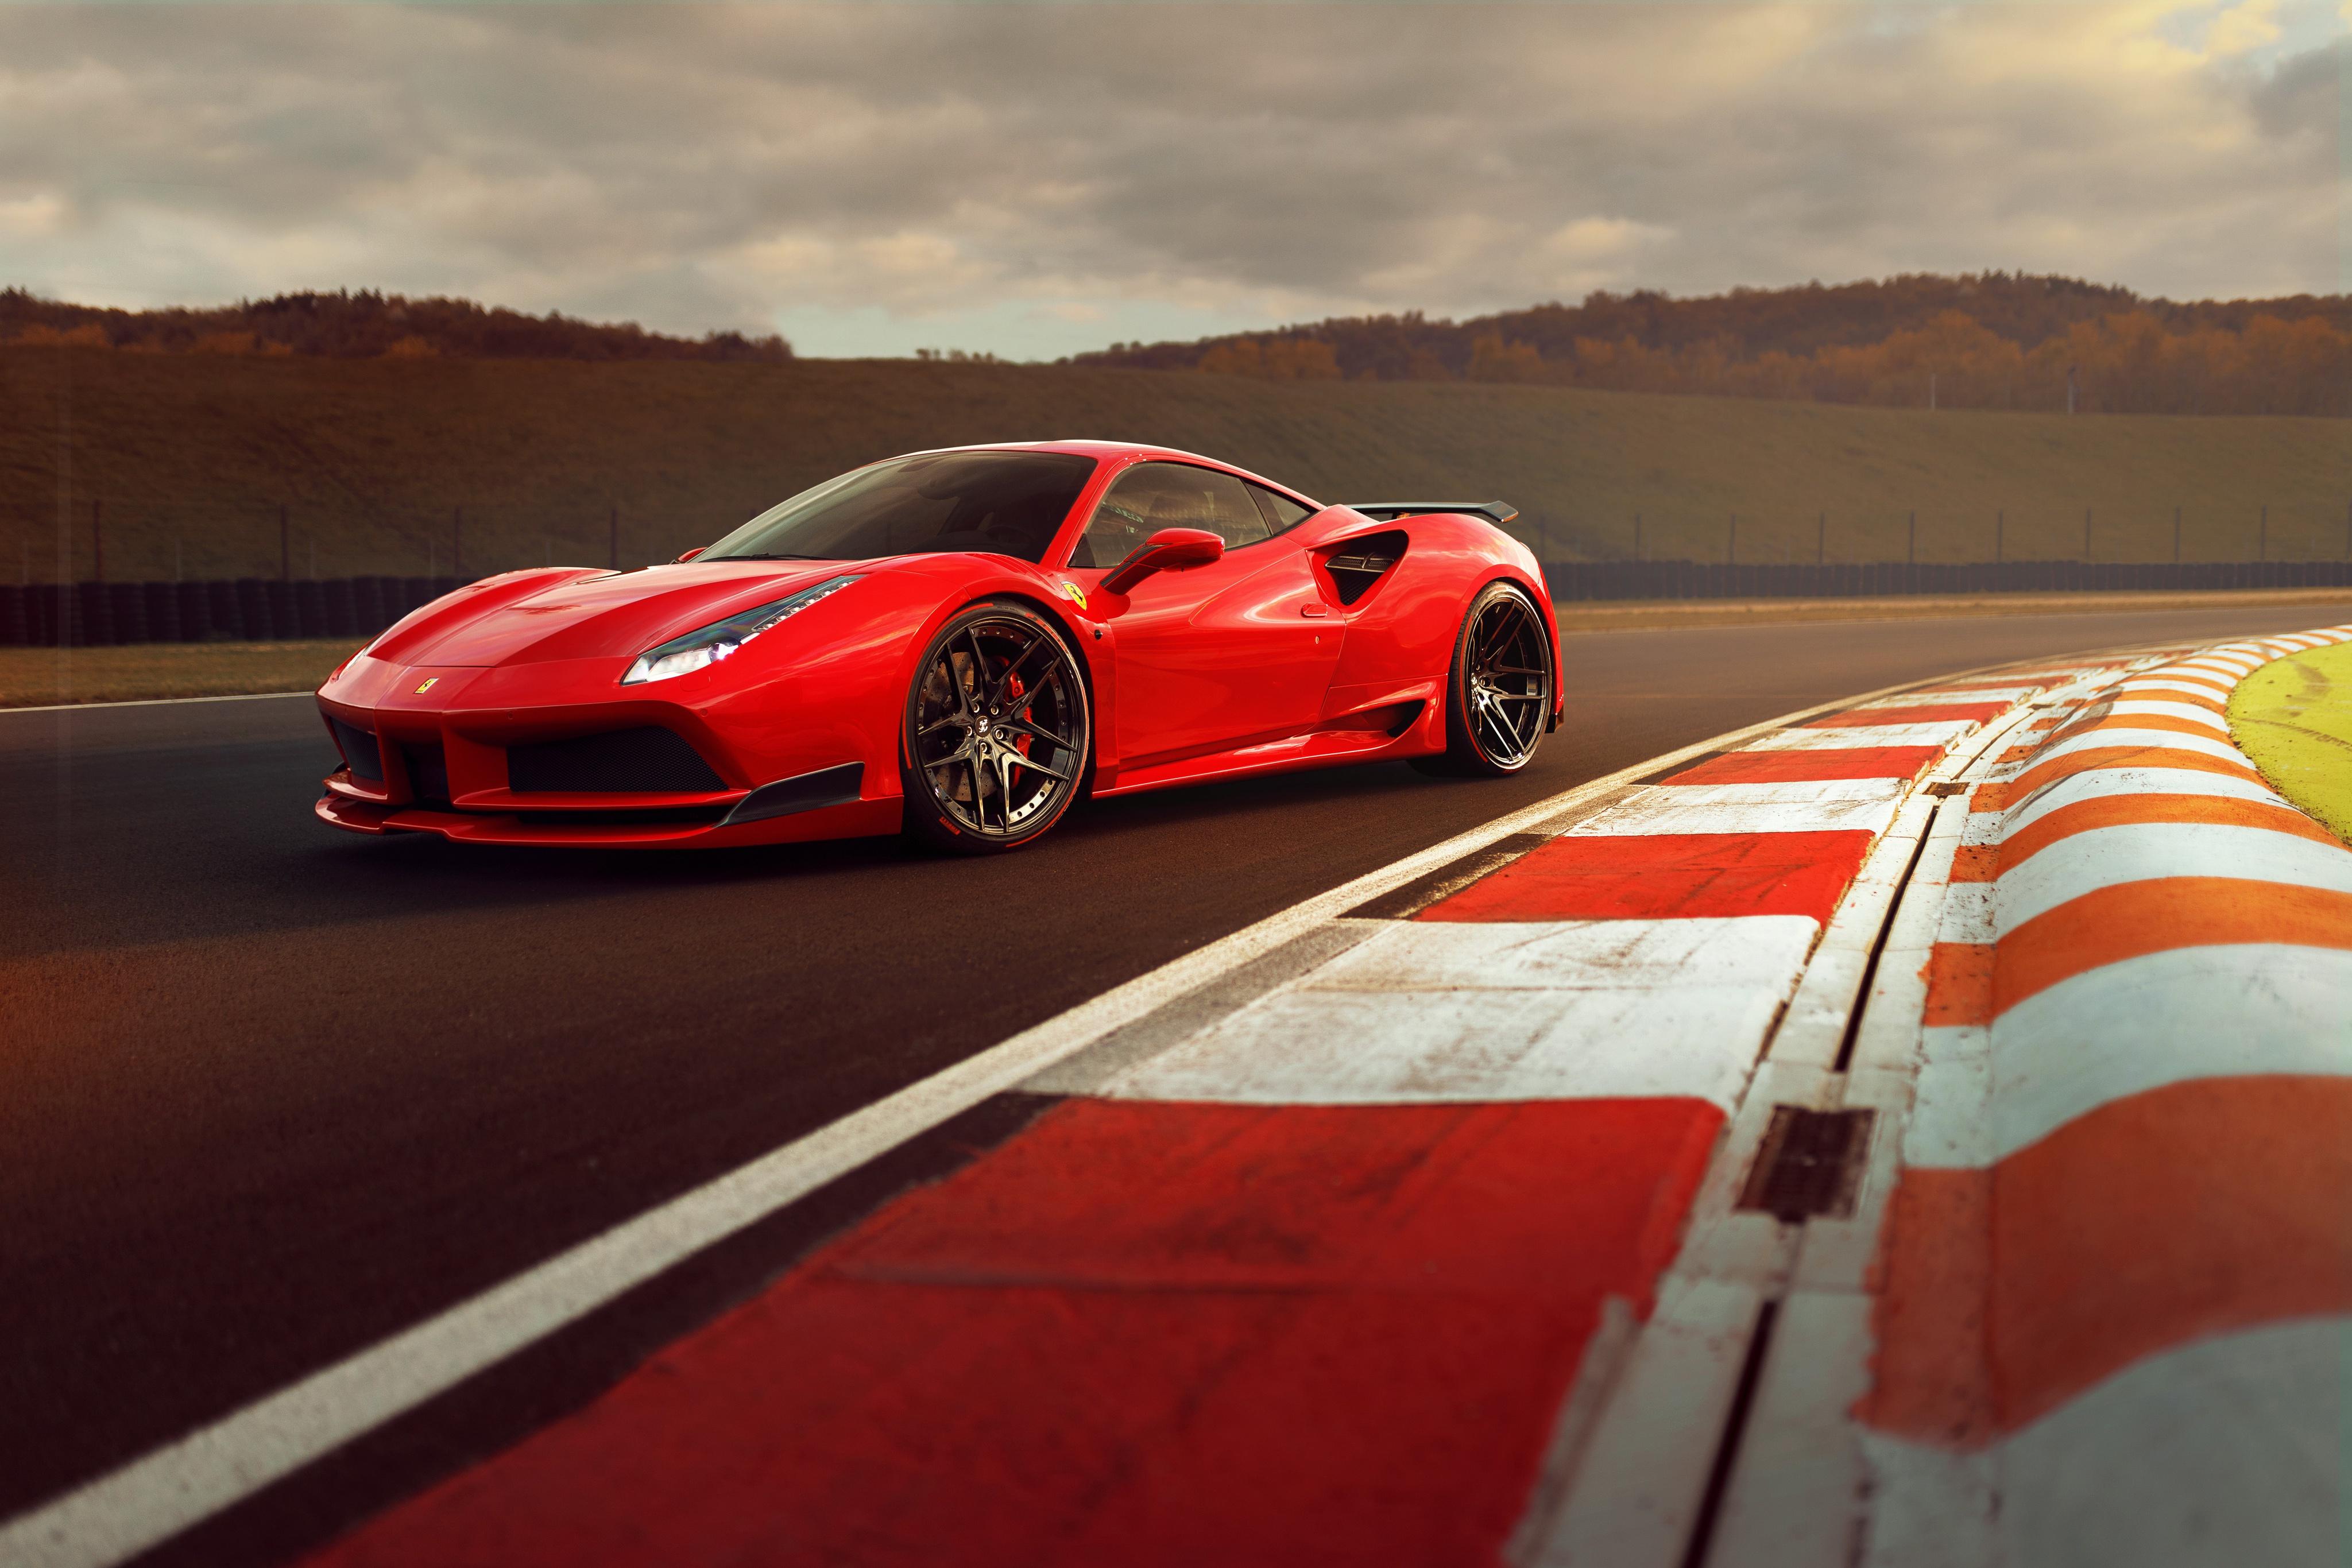 Ferrari 488 Gtb 4k Hd Cars 4k Wallpapers Images Backgrounds